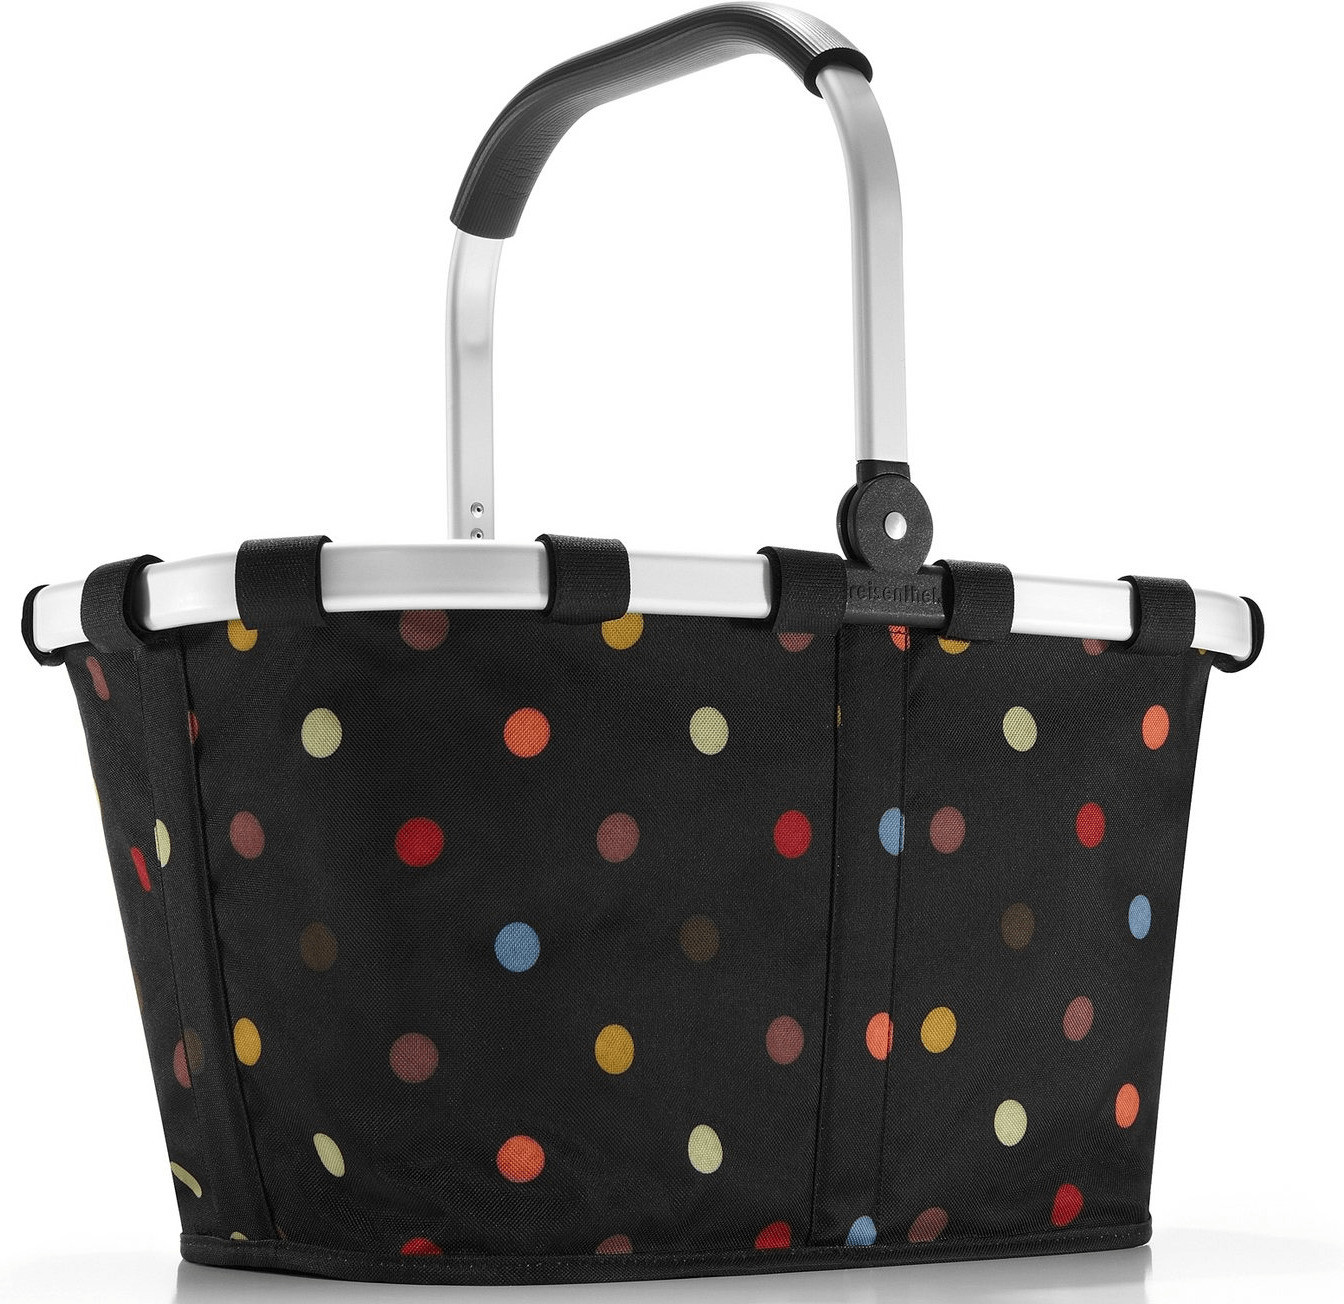 Reisenthel Carrybag dots BK7009